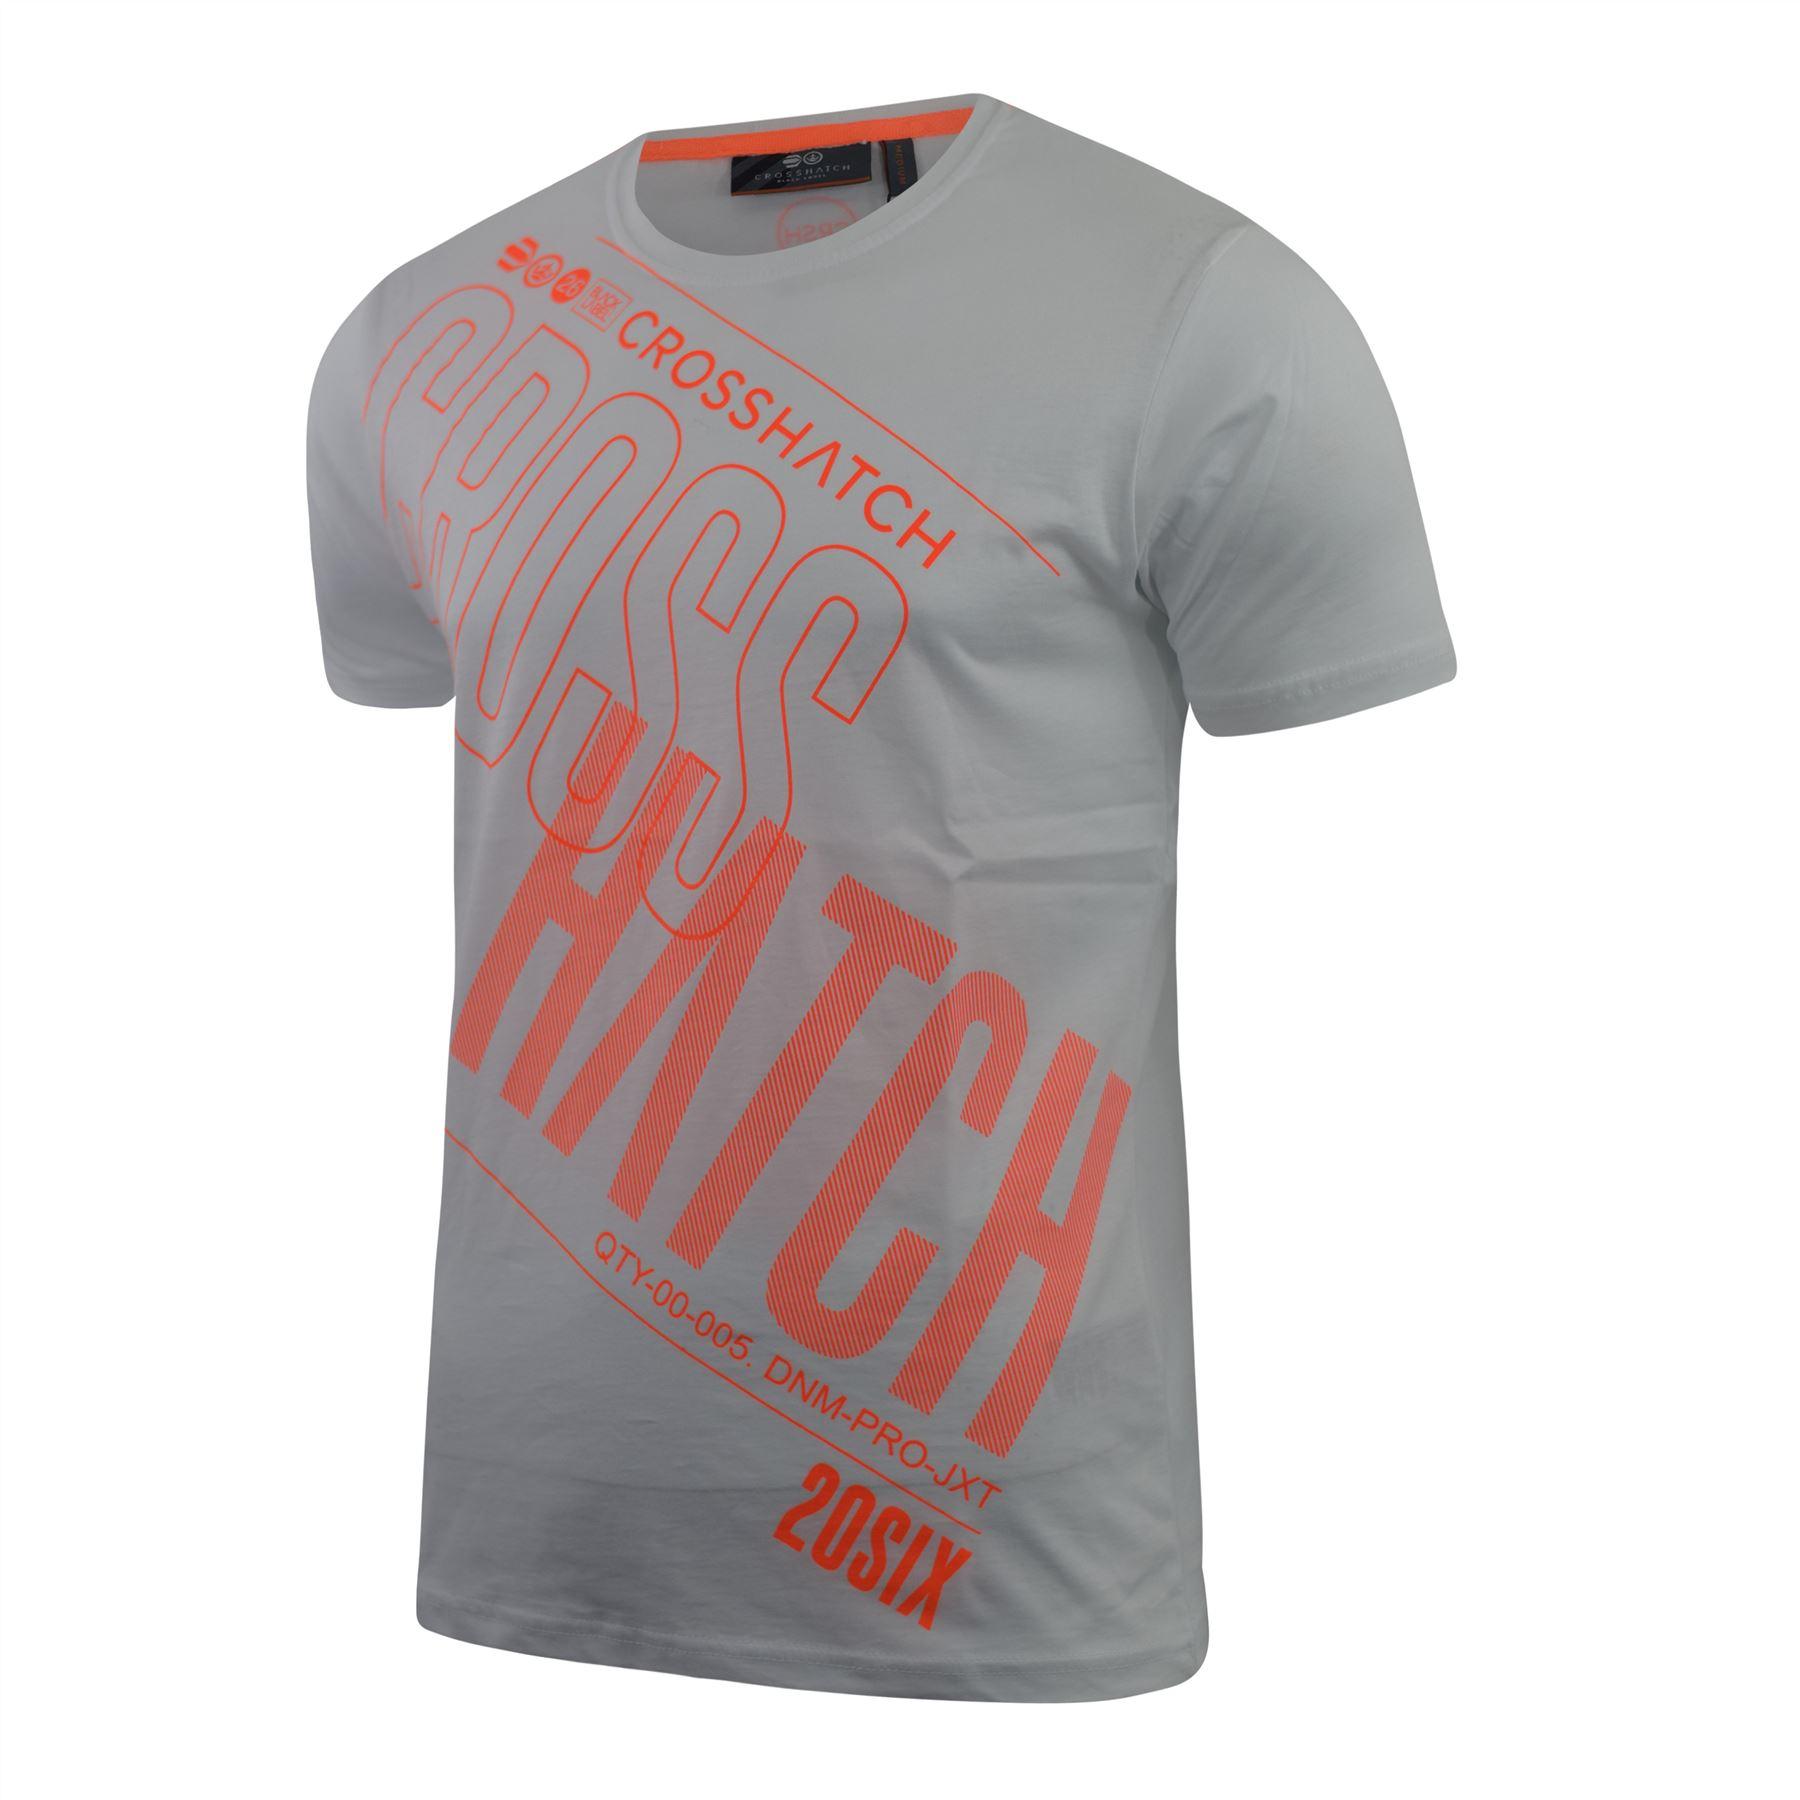 Mens-Crosshatch-T-Shirt-Graphic-Crew-Neck-Tee-Top-Kaeffmore thumbnail 9